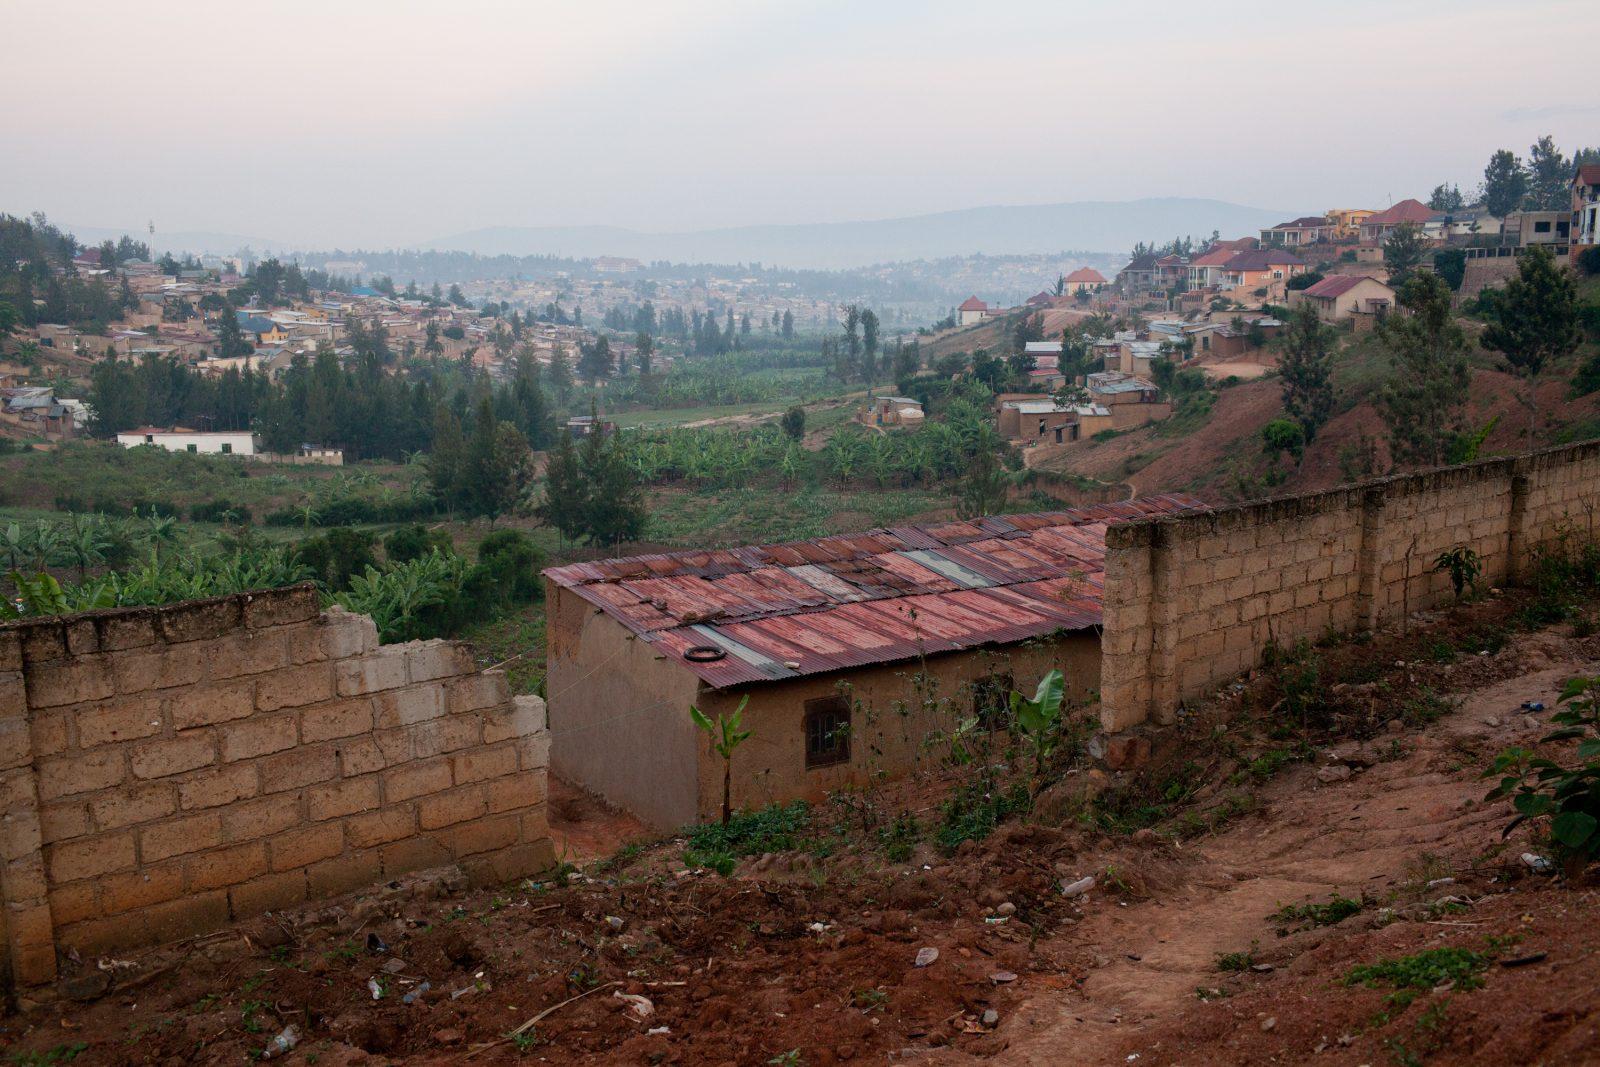 Rwanda-DSM-Michael Rhebergen_small-Srgb-16